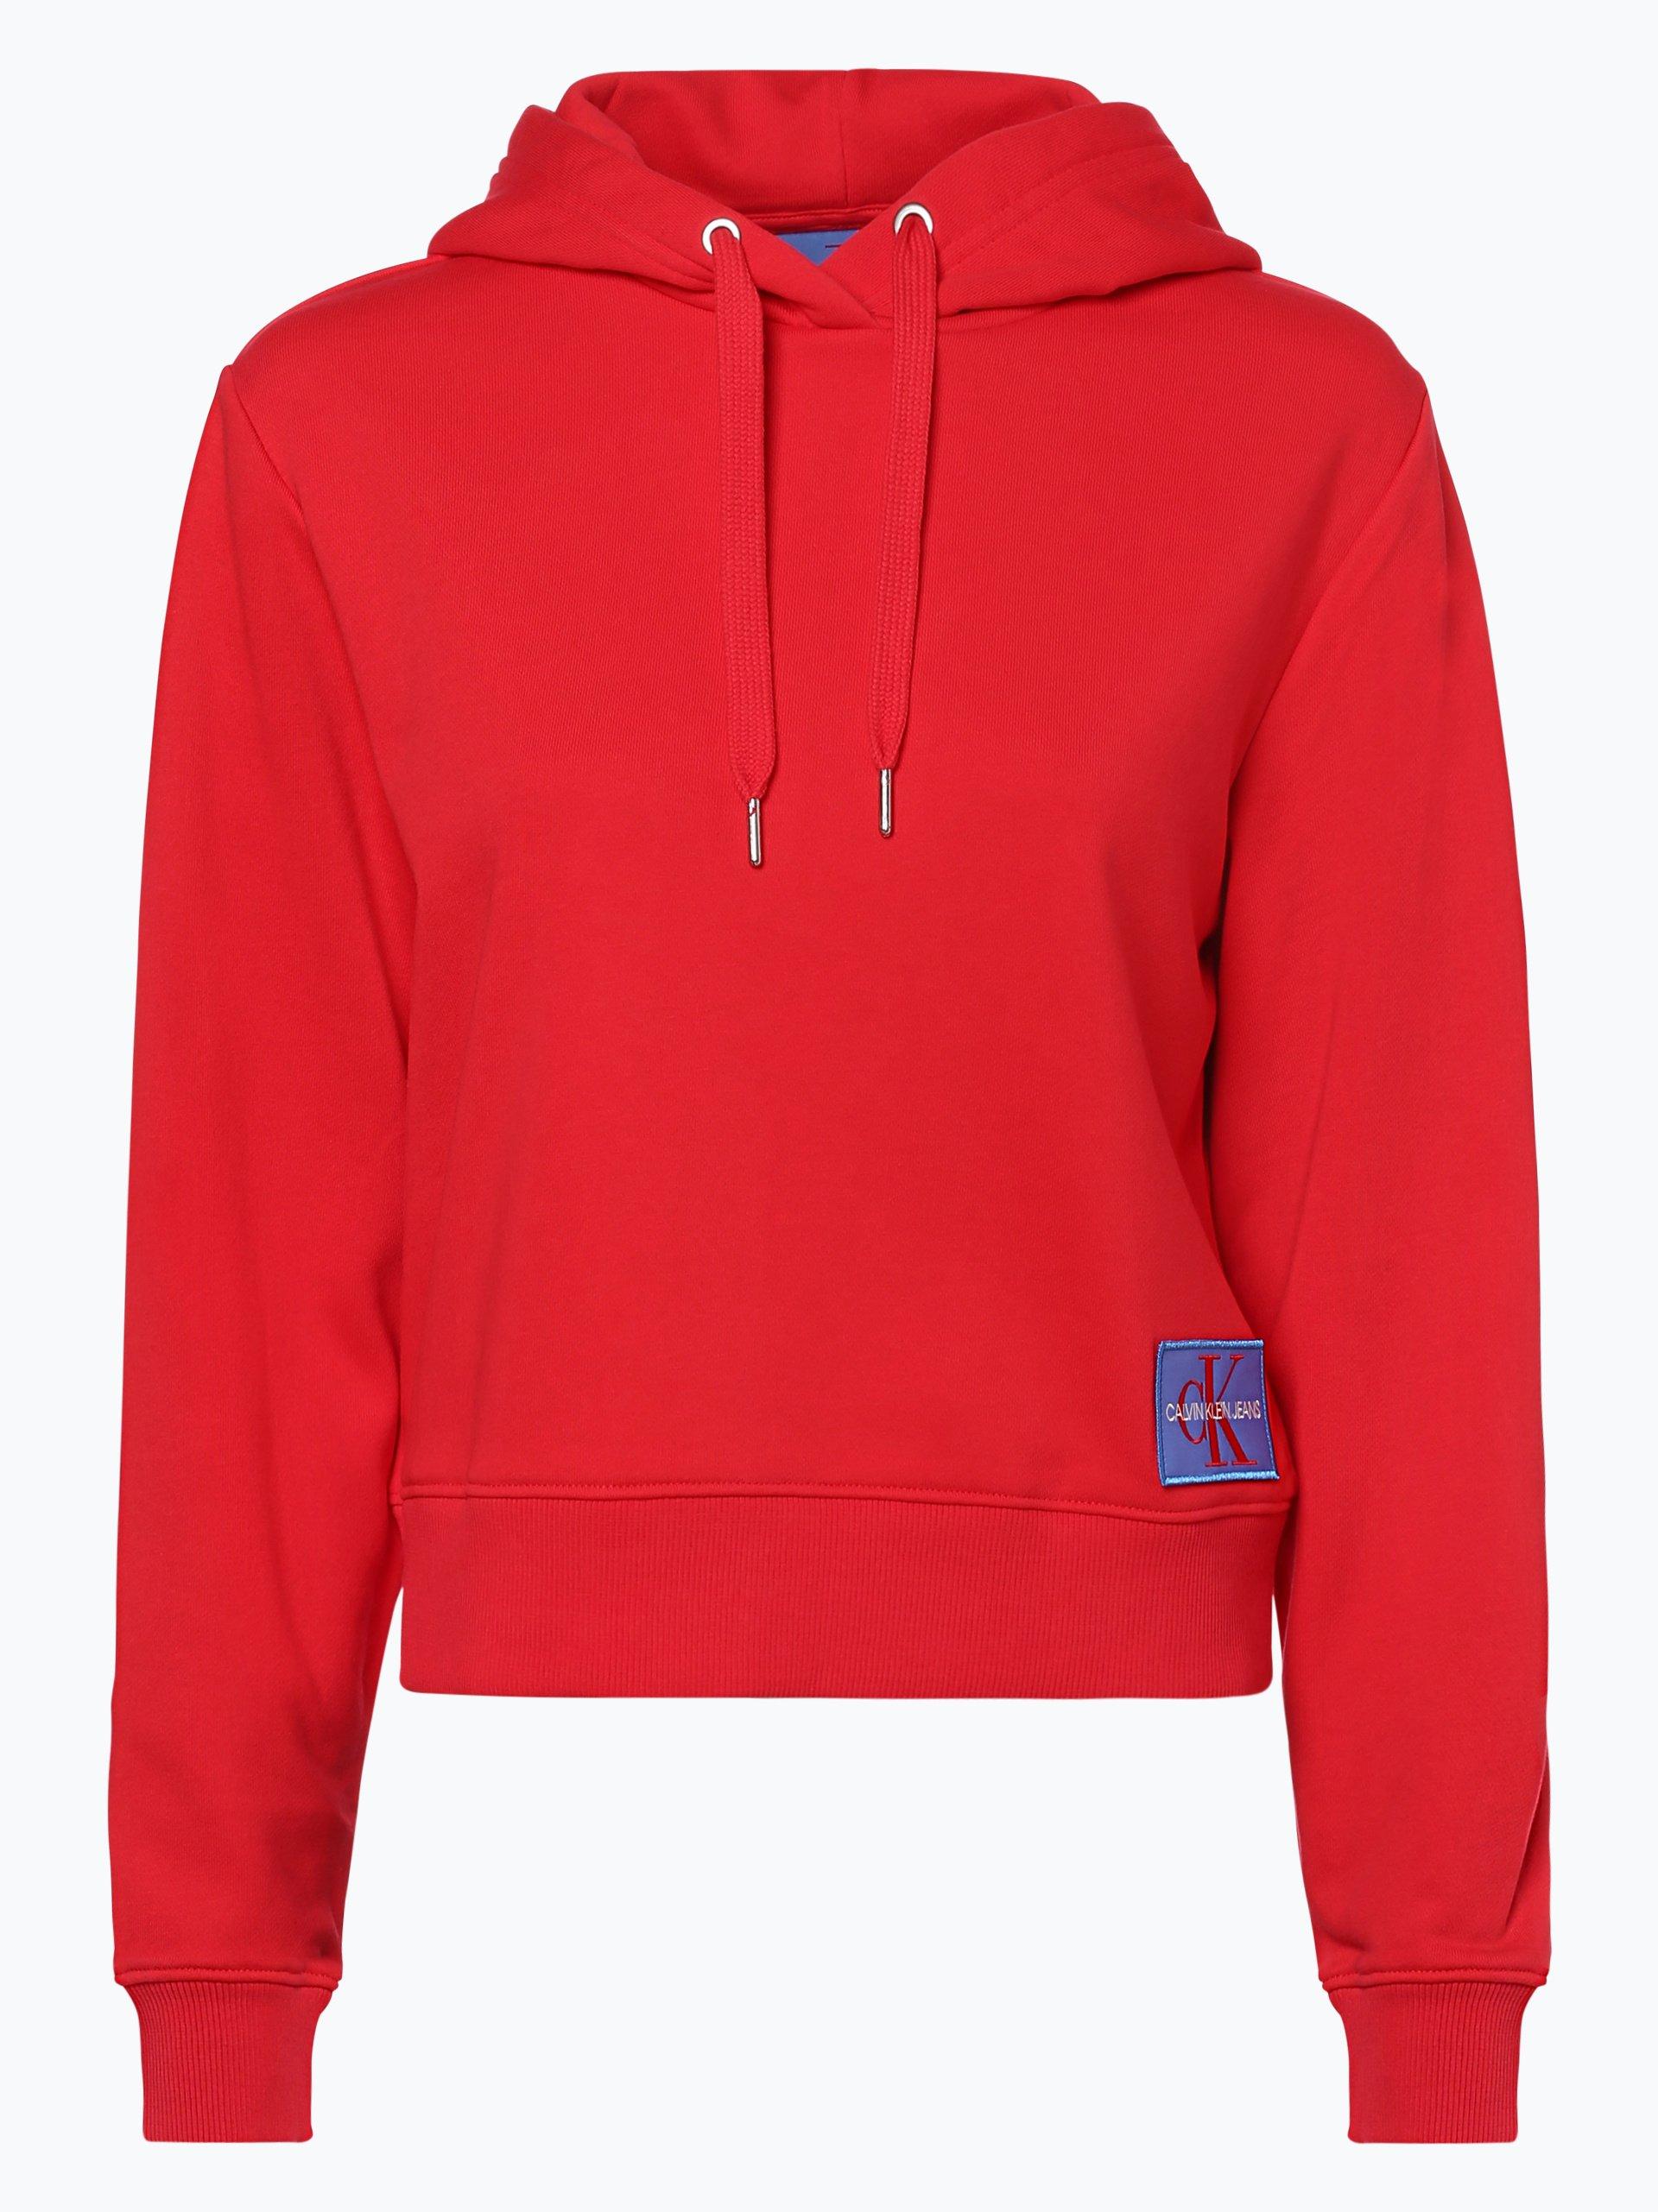 calvin klein jeans damen sweatshirt rot uni online kaufen vangraaf com. Black Bedroom Furniture Sets. Home Design Ideas